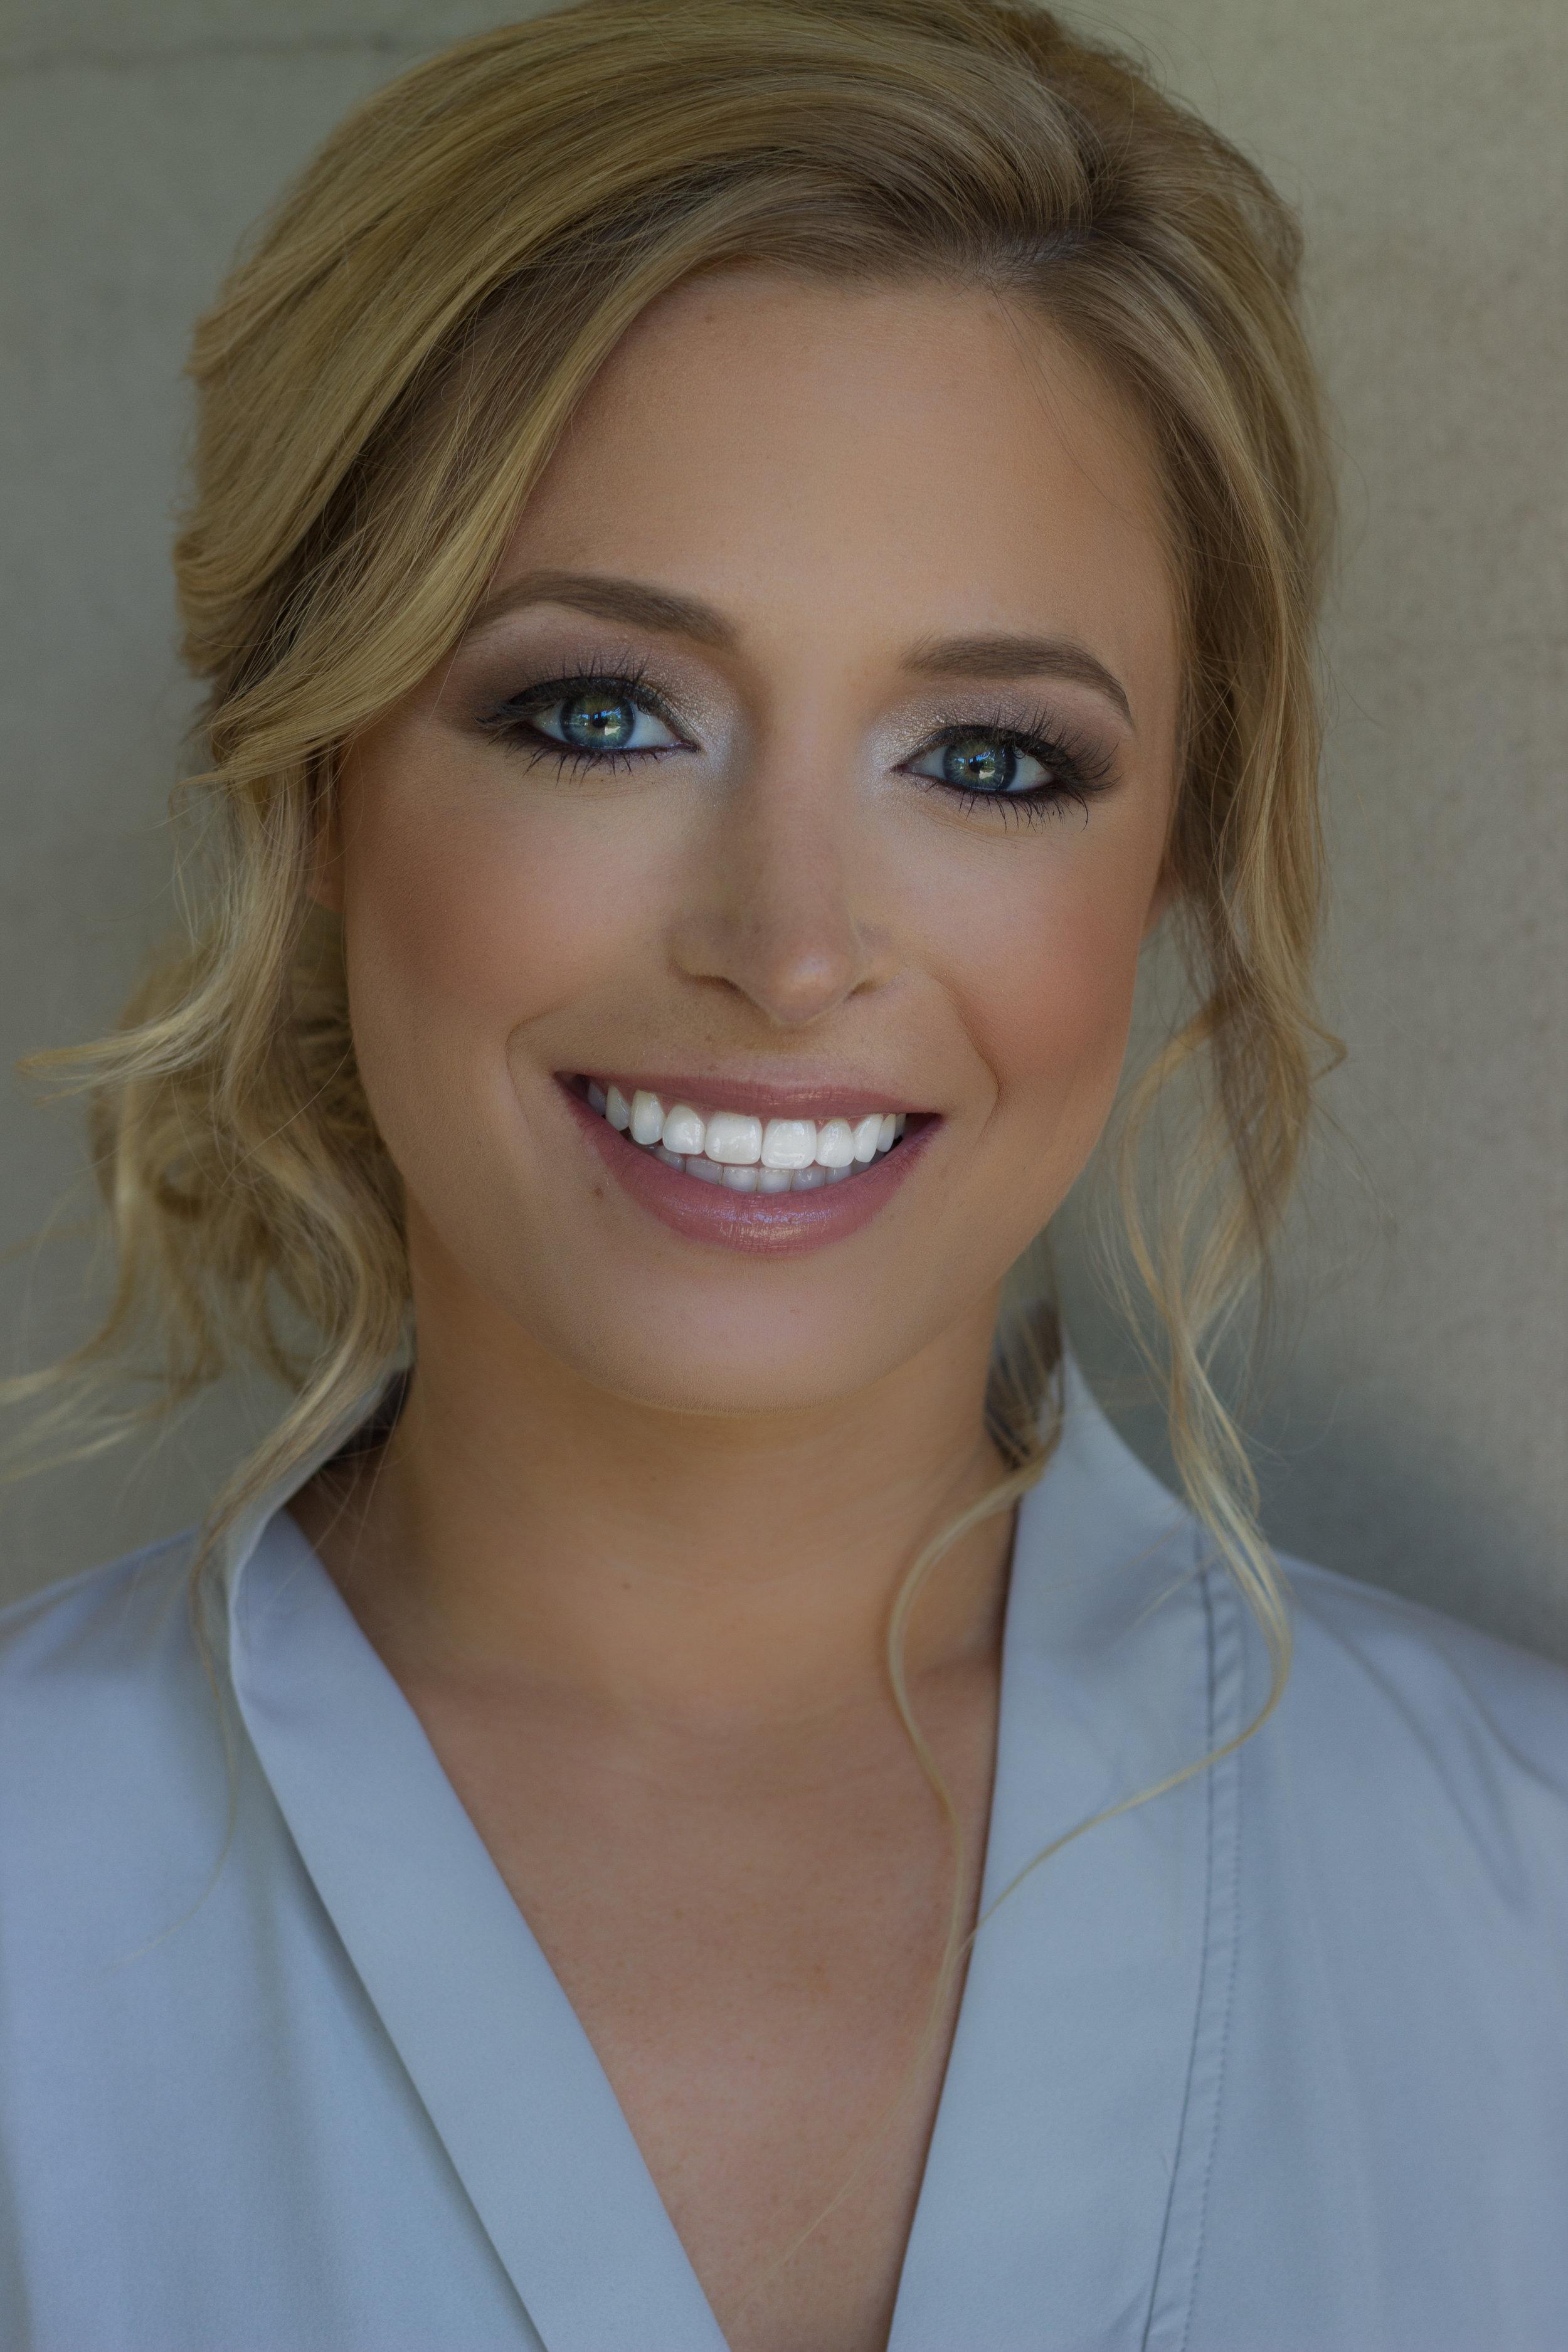 Makeup by Jessica Mieszala